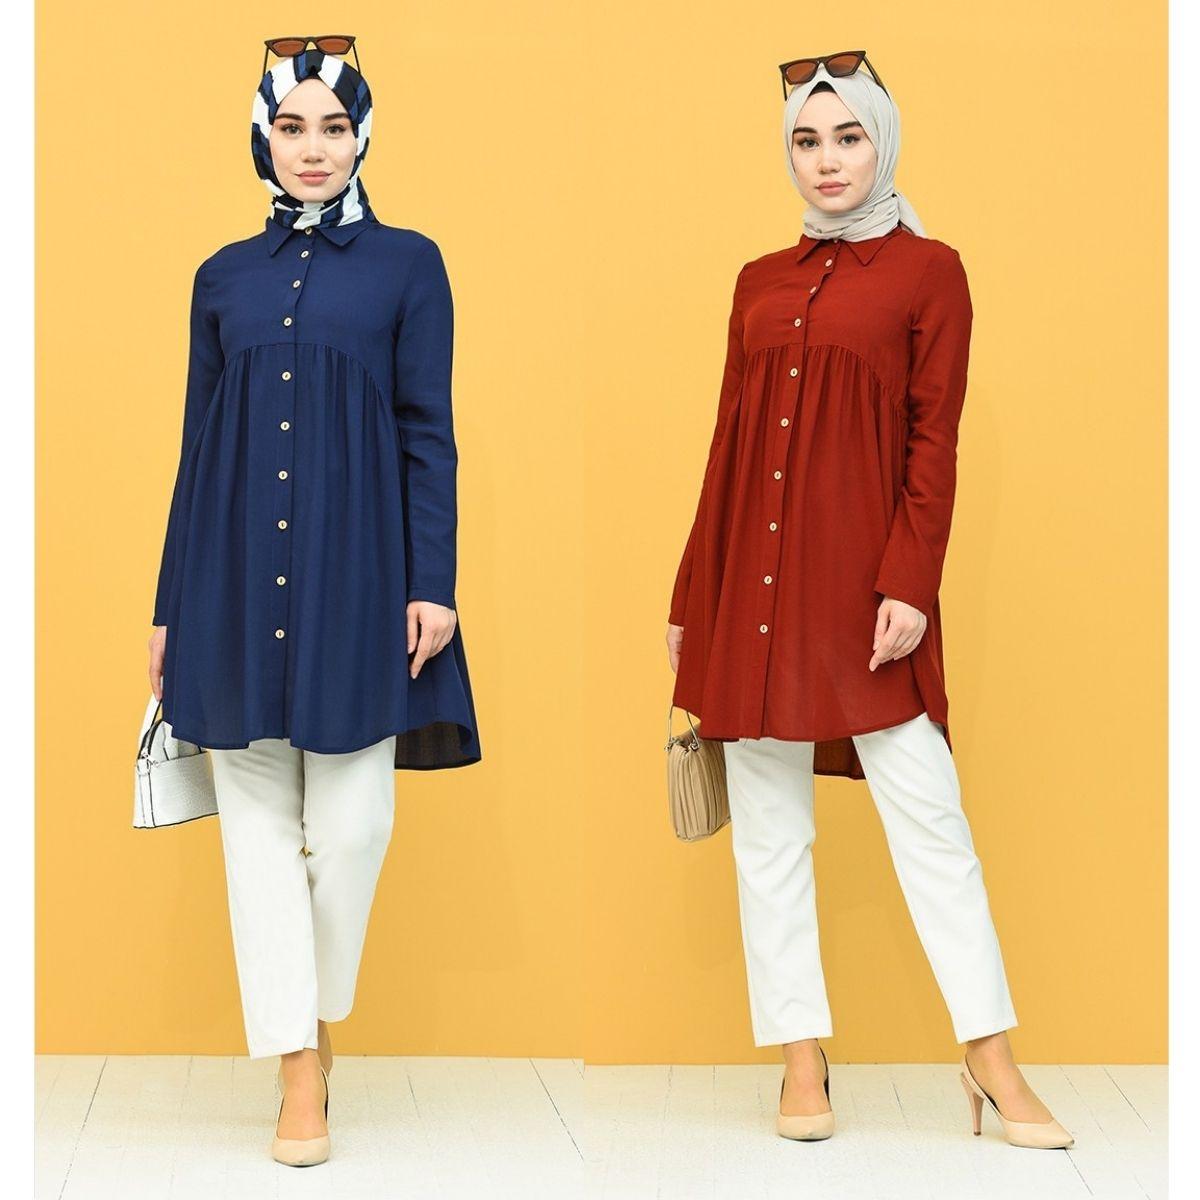 Gathered Buttons Tunic Unlined Long Sleeve Shirt Collar Seasonal Casual Women Muslim Fashion Hijab Wears Casual Stylish Elegants